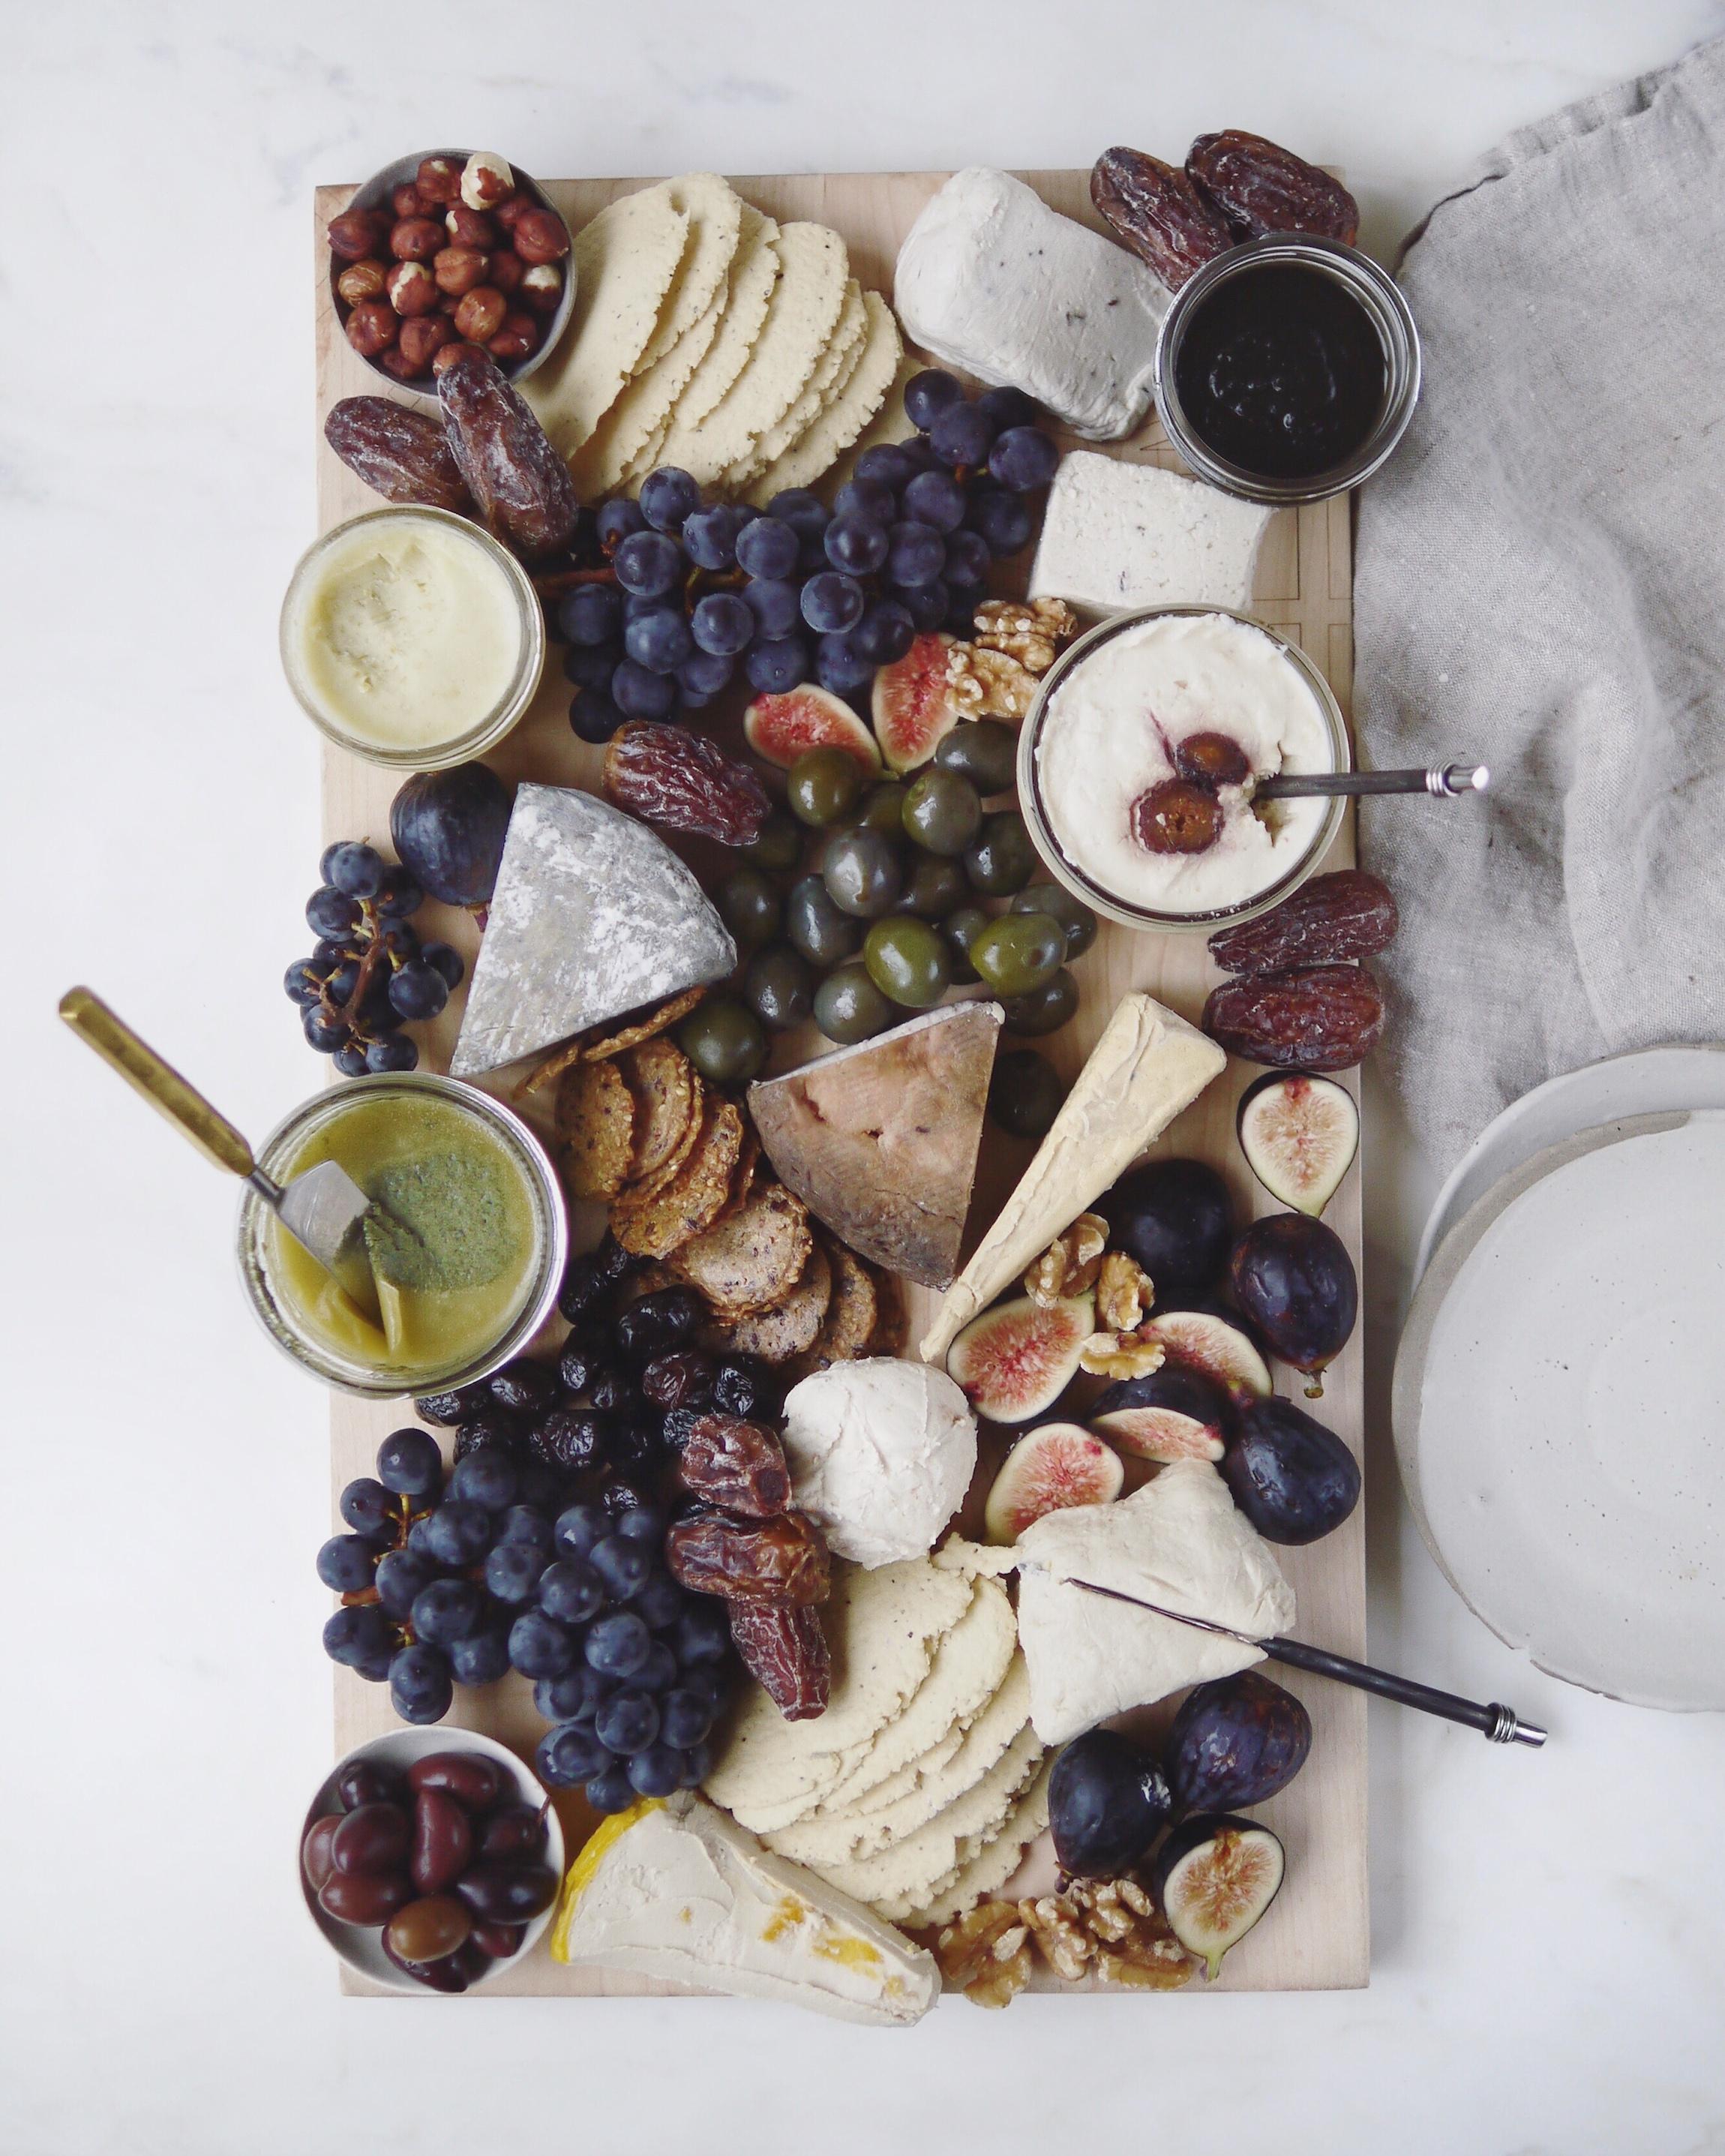 Nut cheese platter